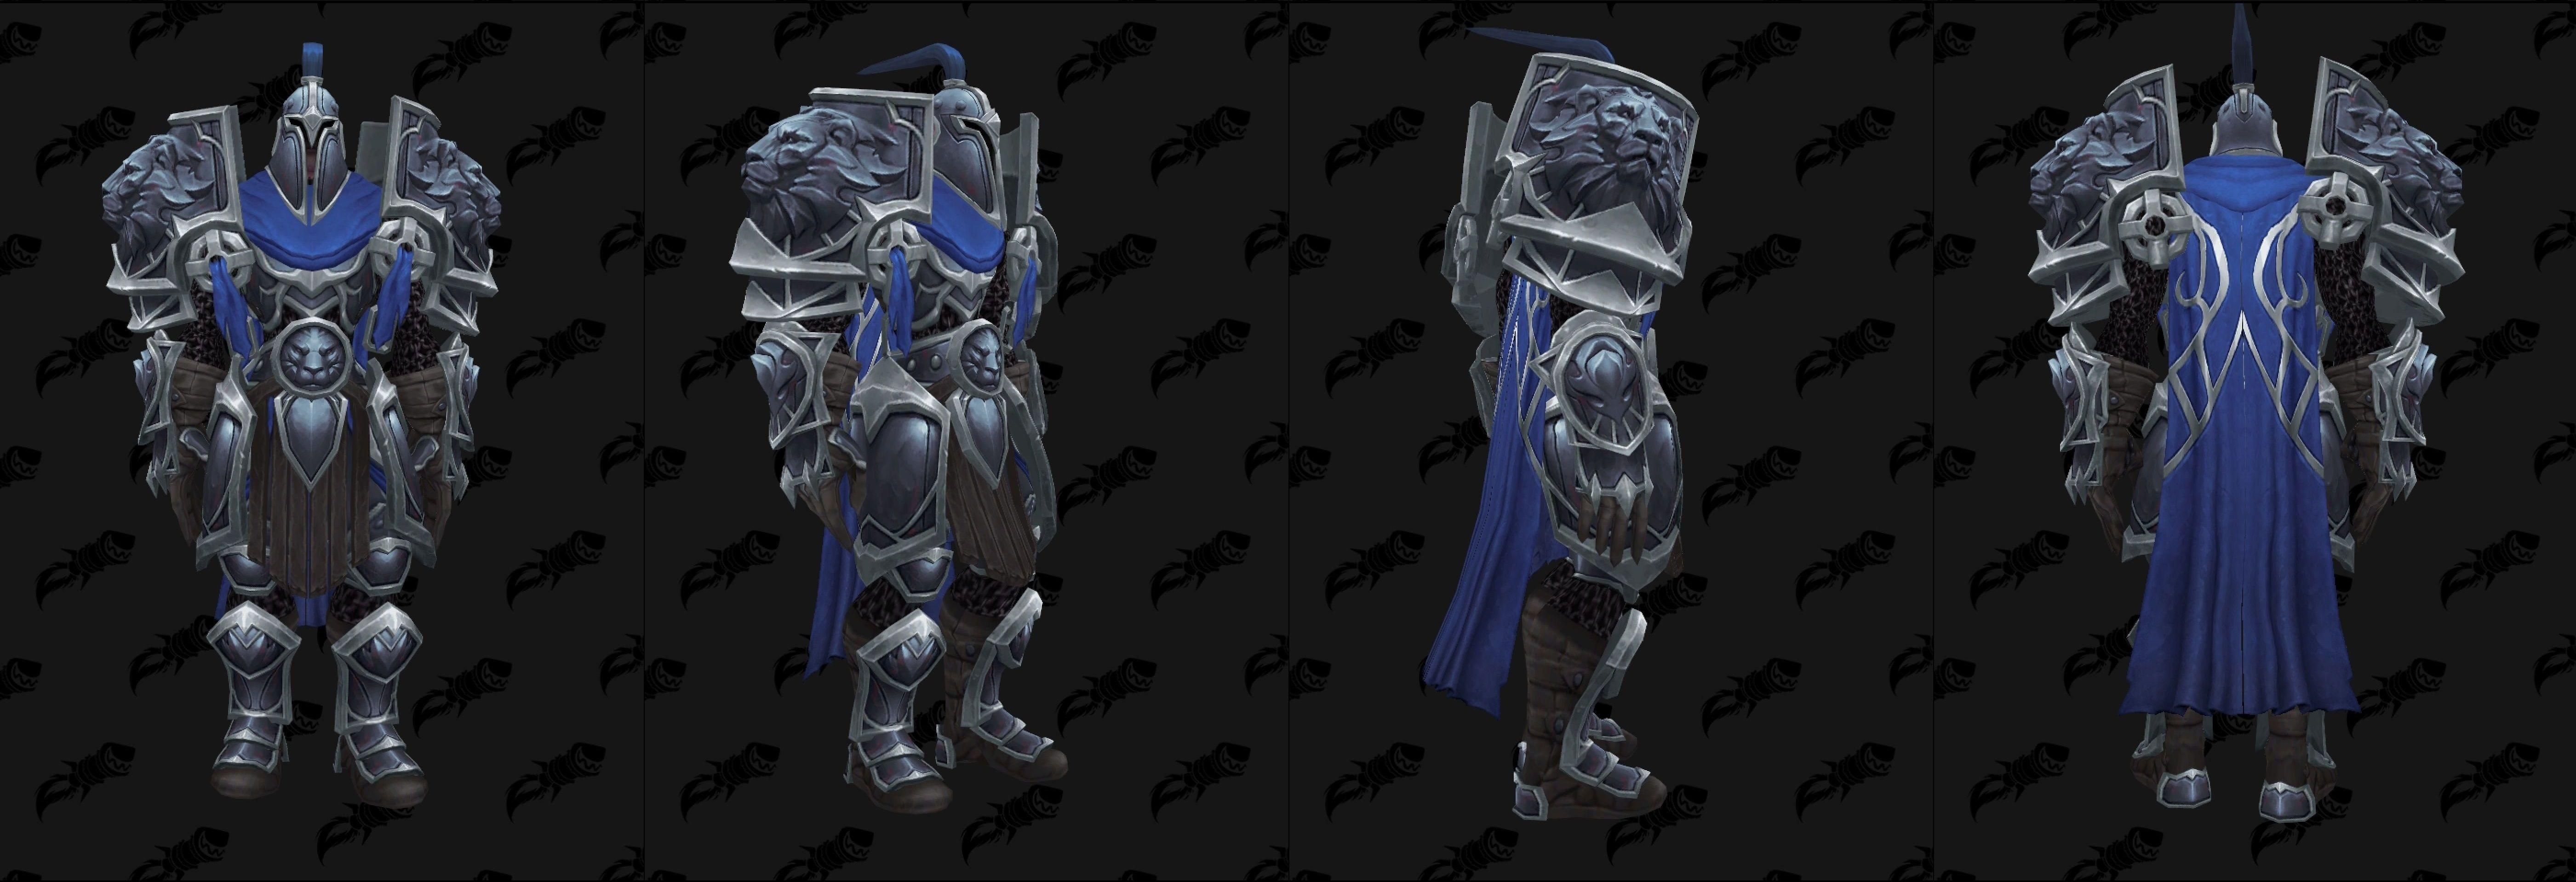 WoW Warfront Armor Human Set 3